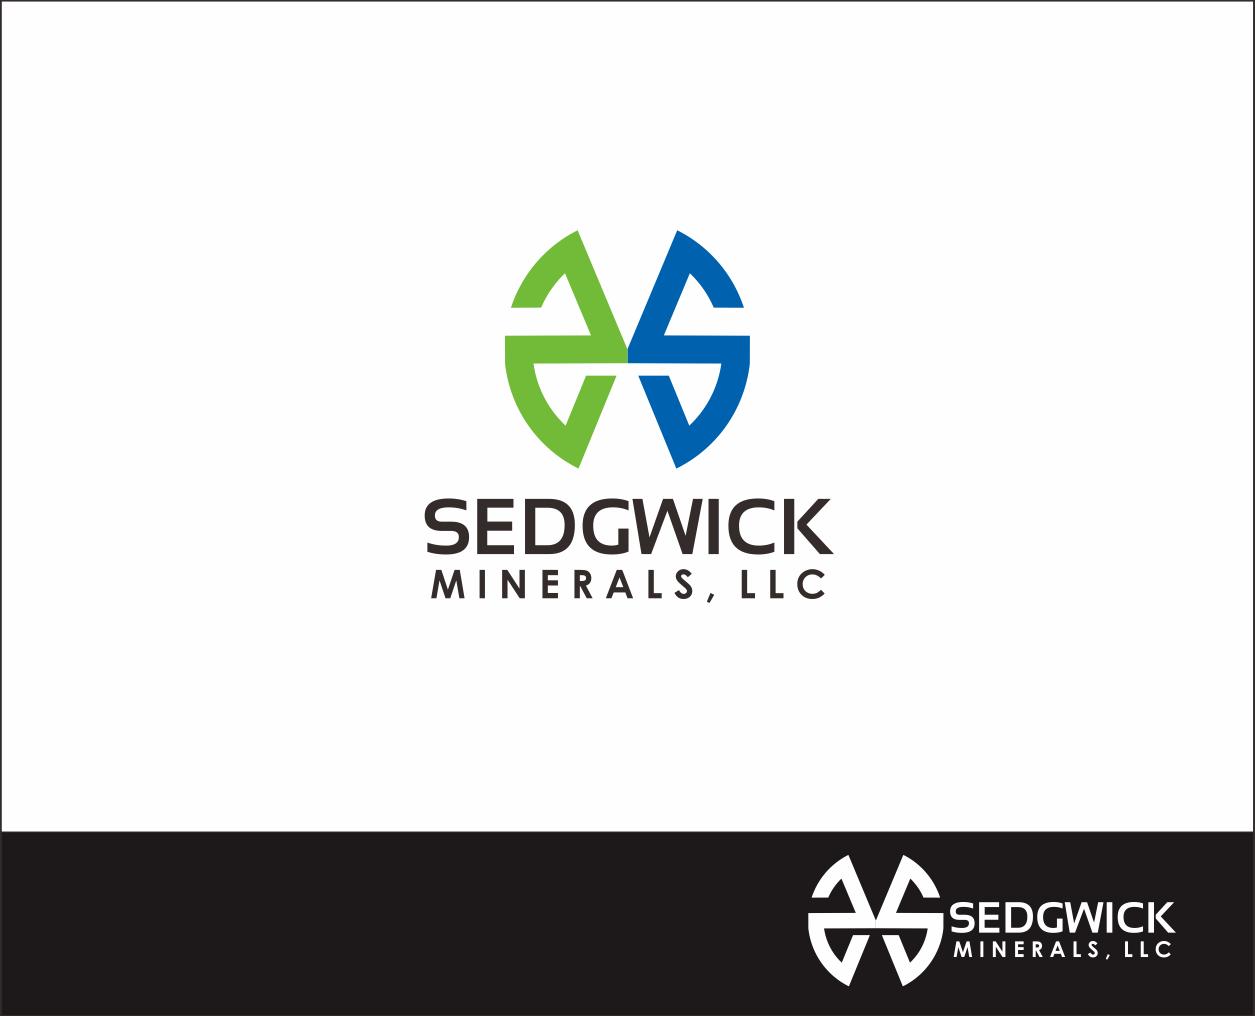 Logo Design by Armada Jamaluddin - Entry No. 47 in the Logo Design Contest Inspiring Logo Design for Sedgwick Minerals, LLC.